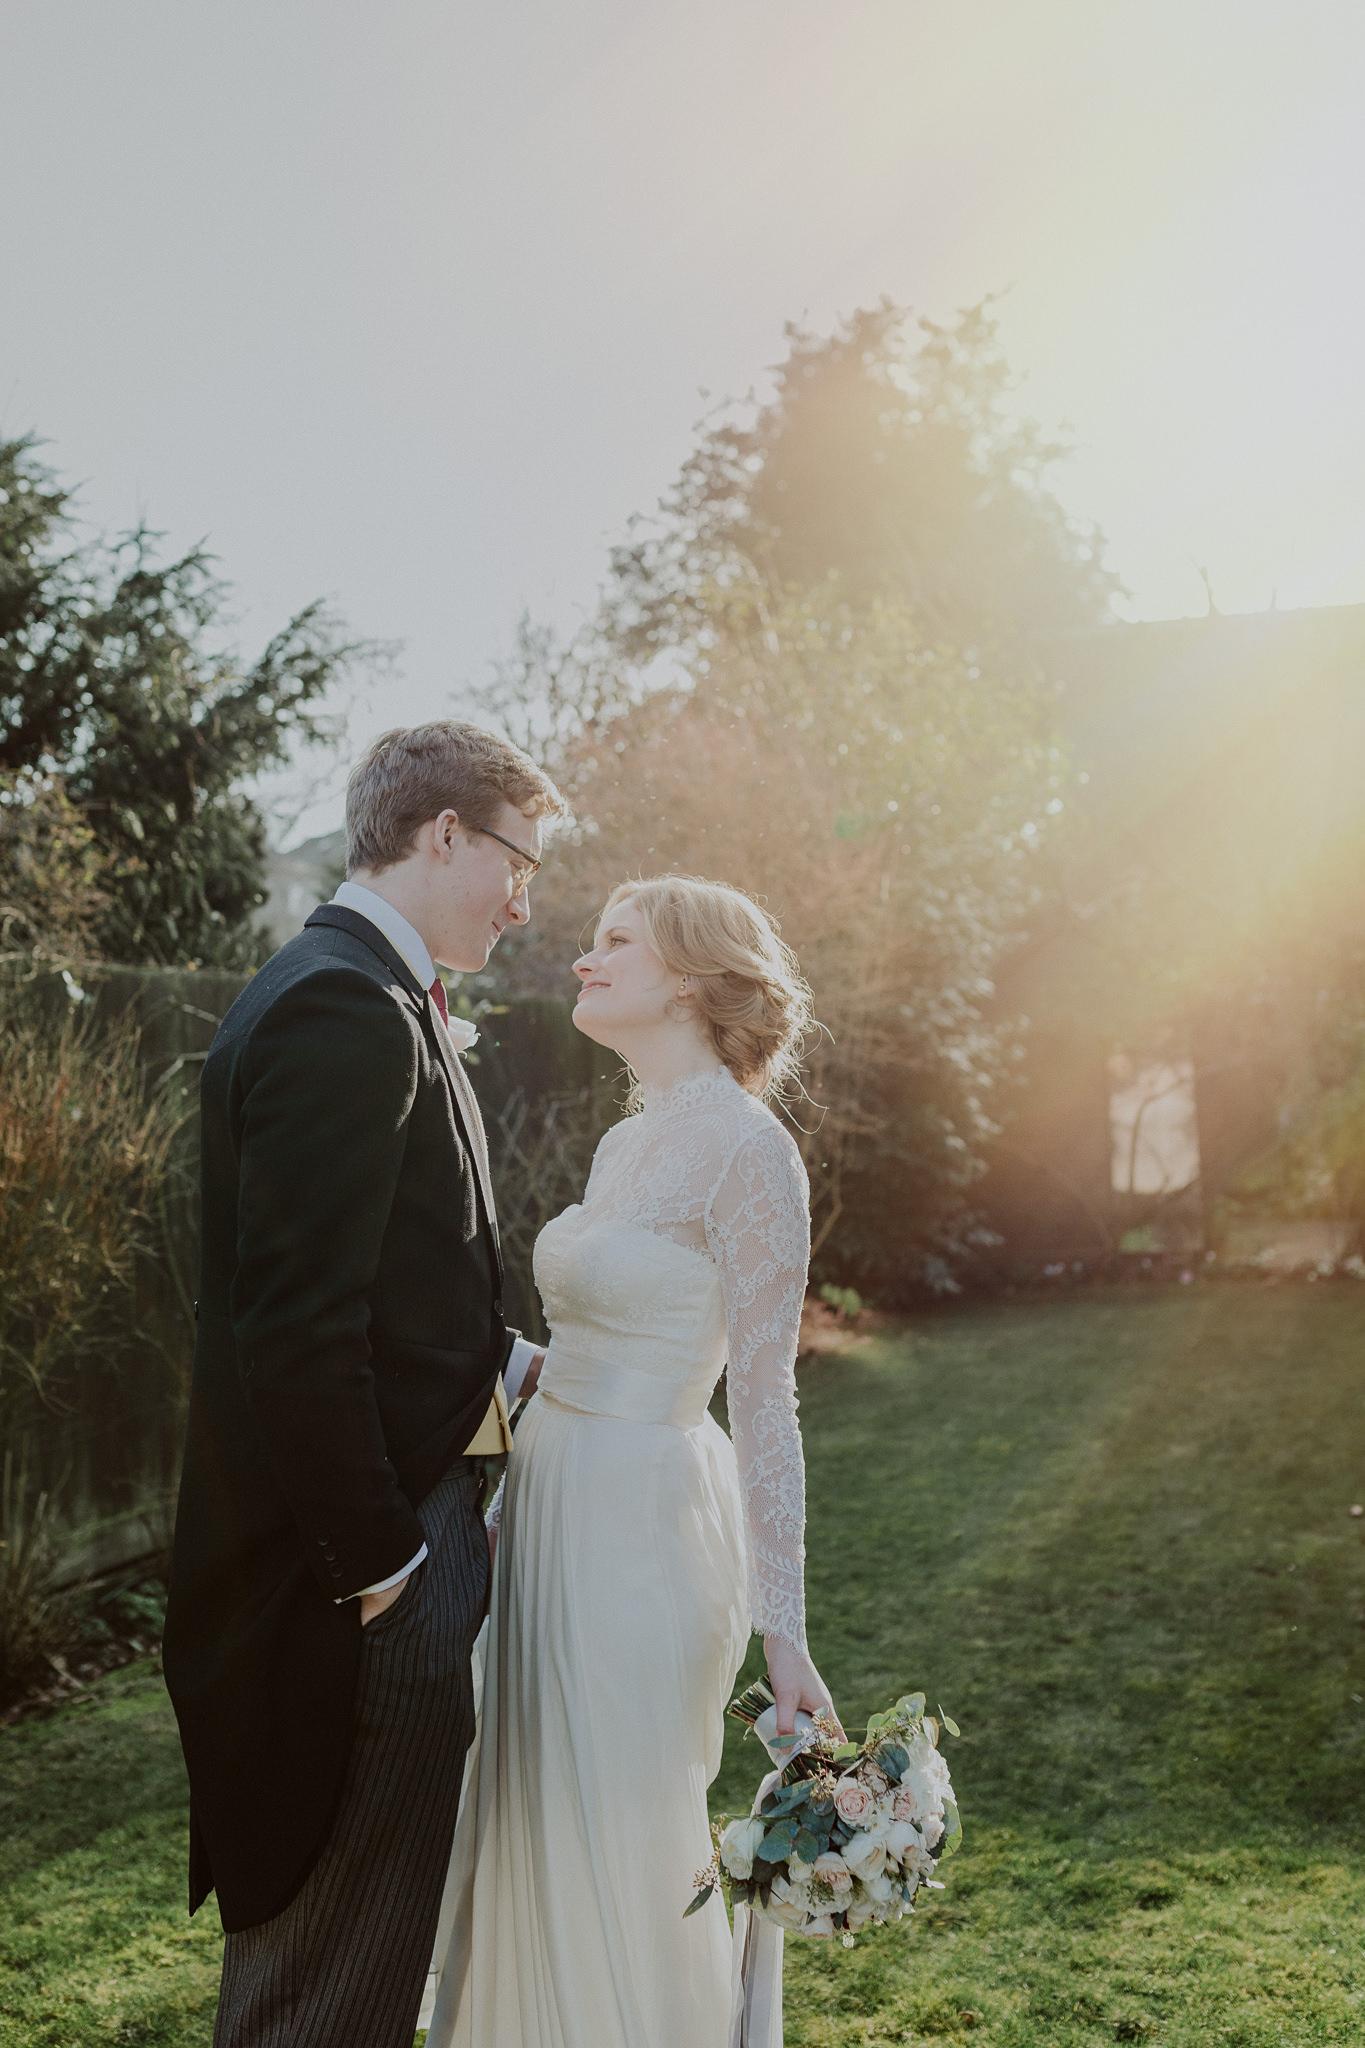 hampstead_wedding_photography_kate_gray-12.jpg